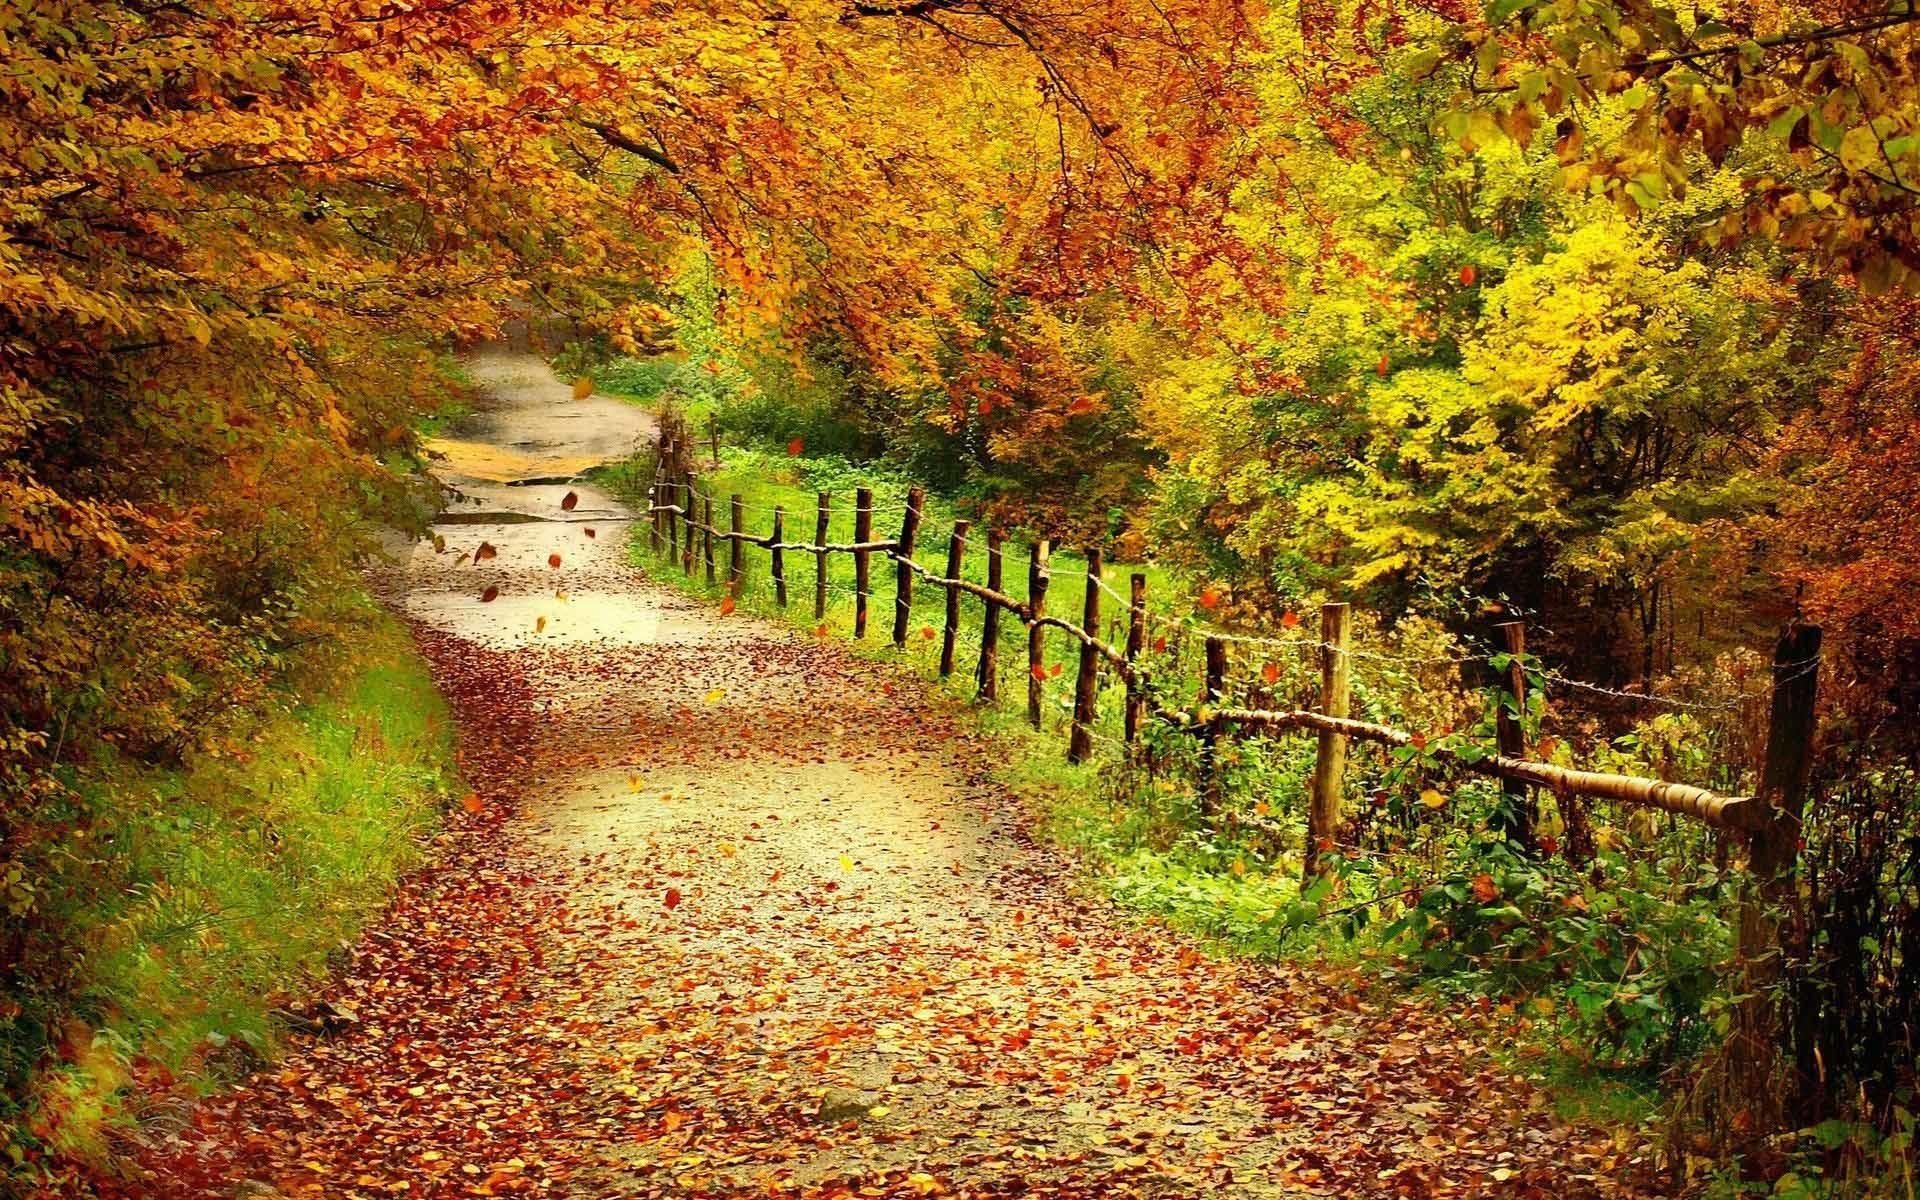 HD Fall Foliage Wallpaper.